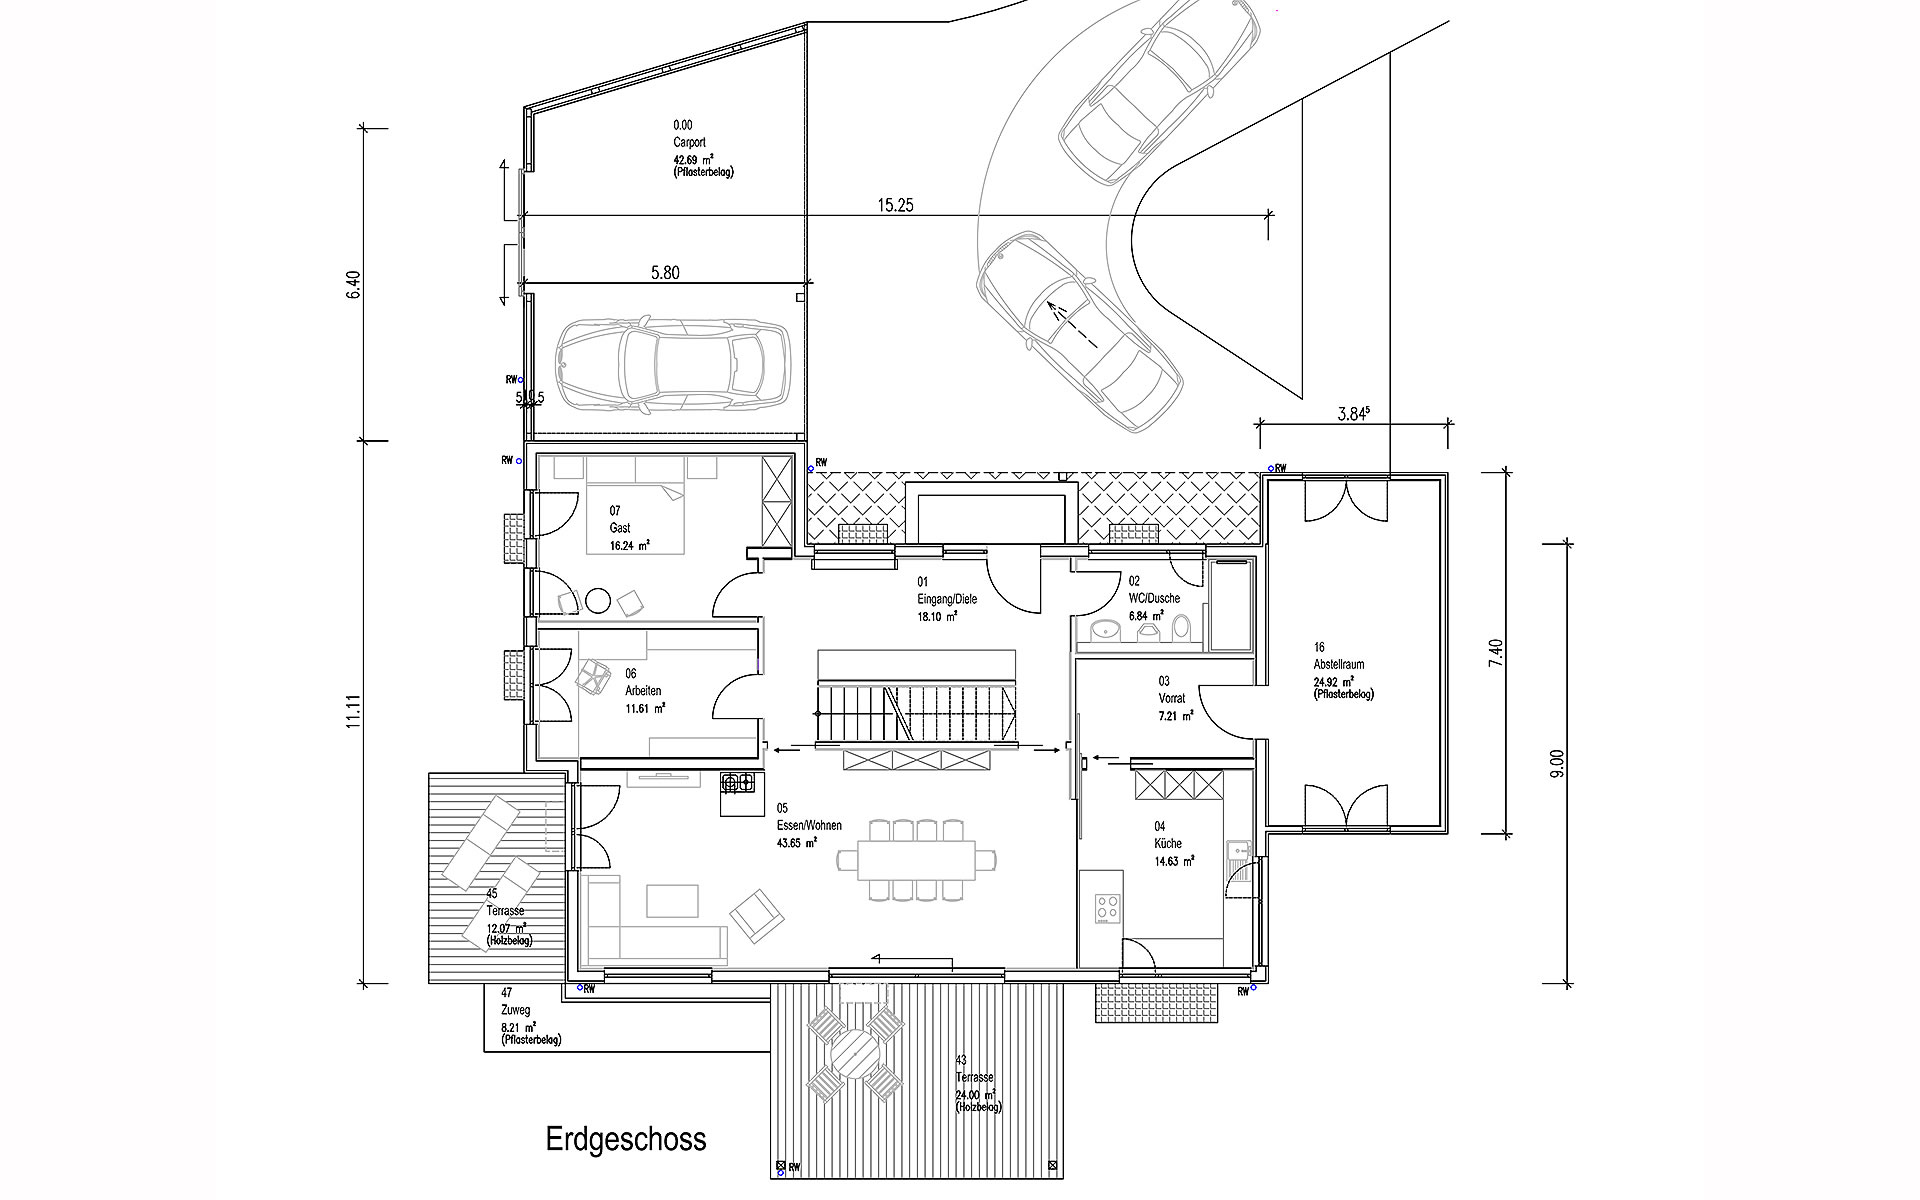 Erdgeschoss Oberndorf von Sonnleitner Holzbauwerke GmbH & Co. KG